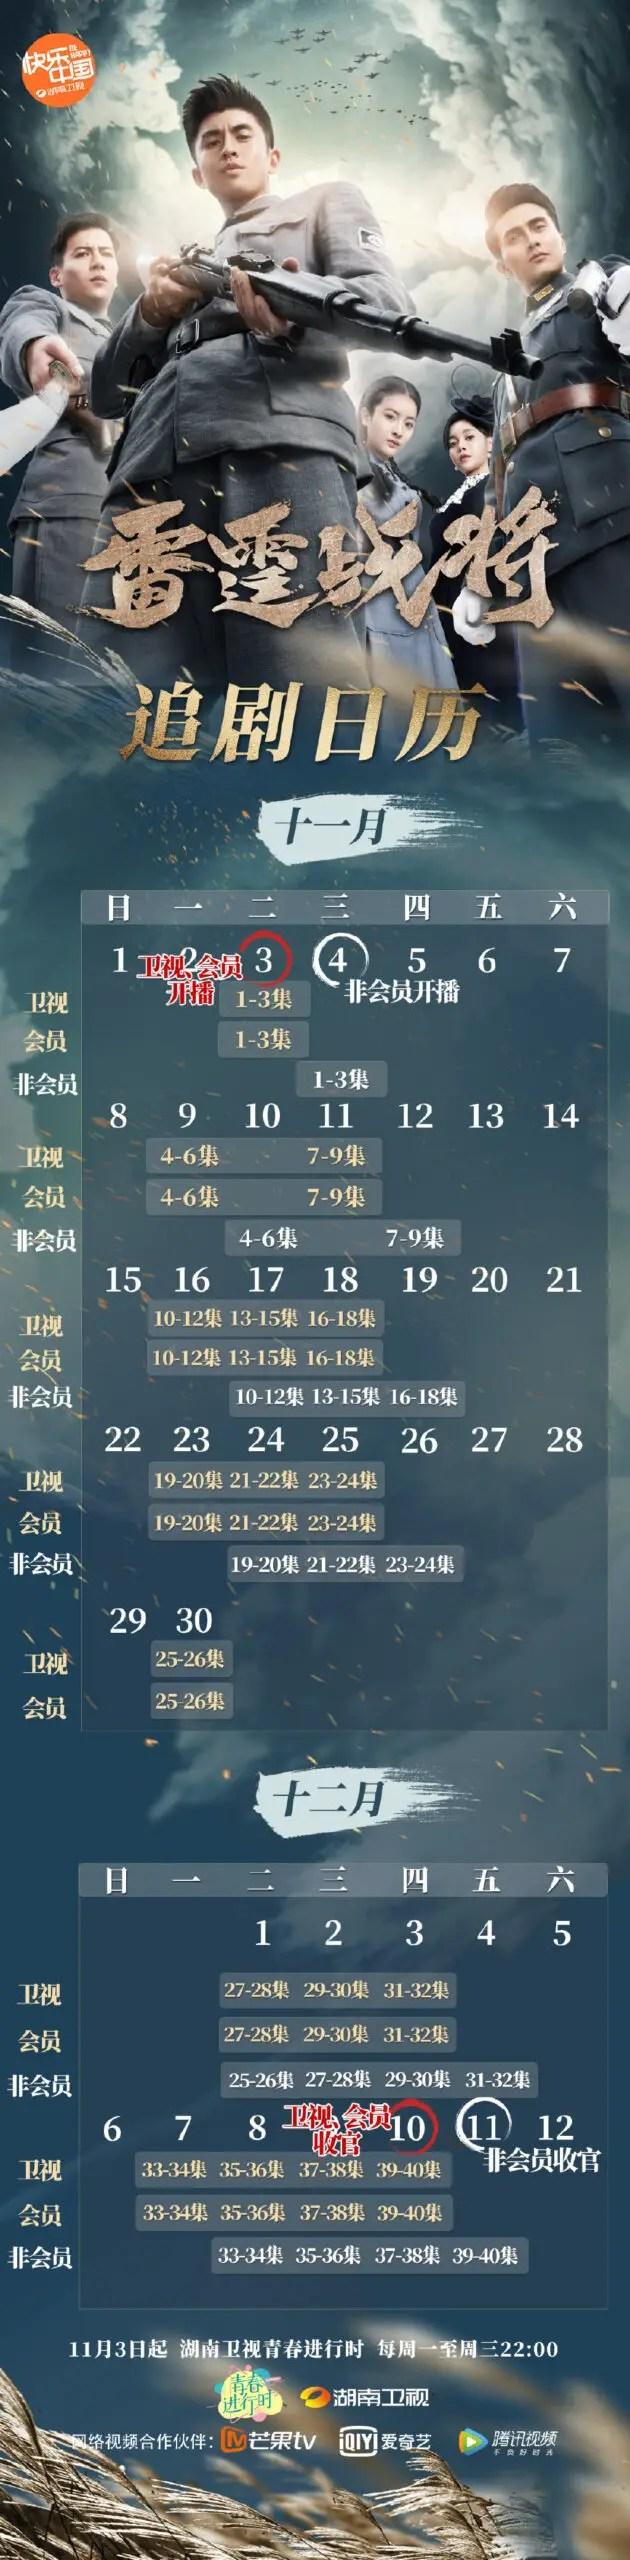 Drawing Sword 3 Chinese Drama Airing Calendar